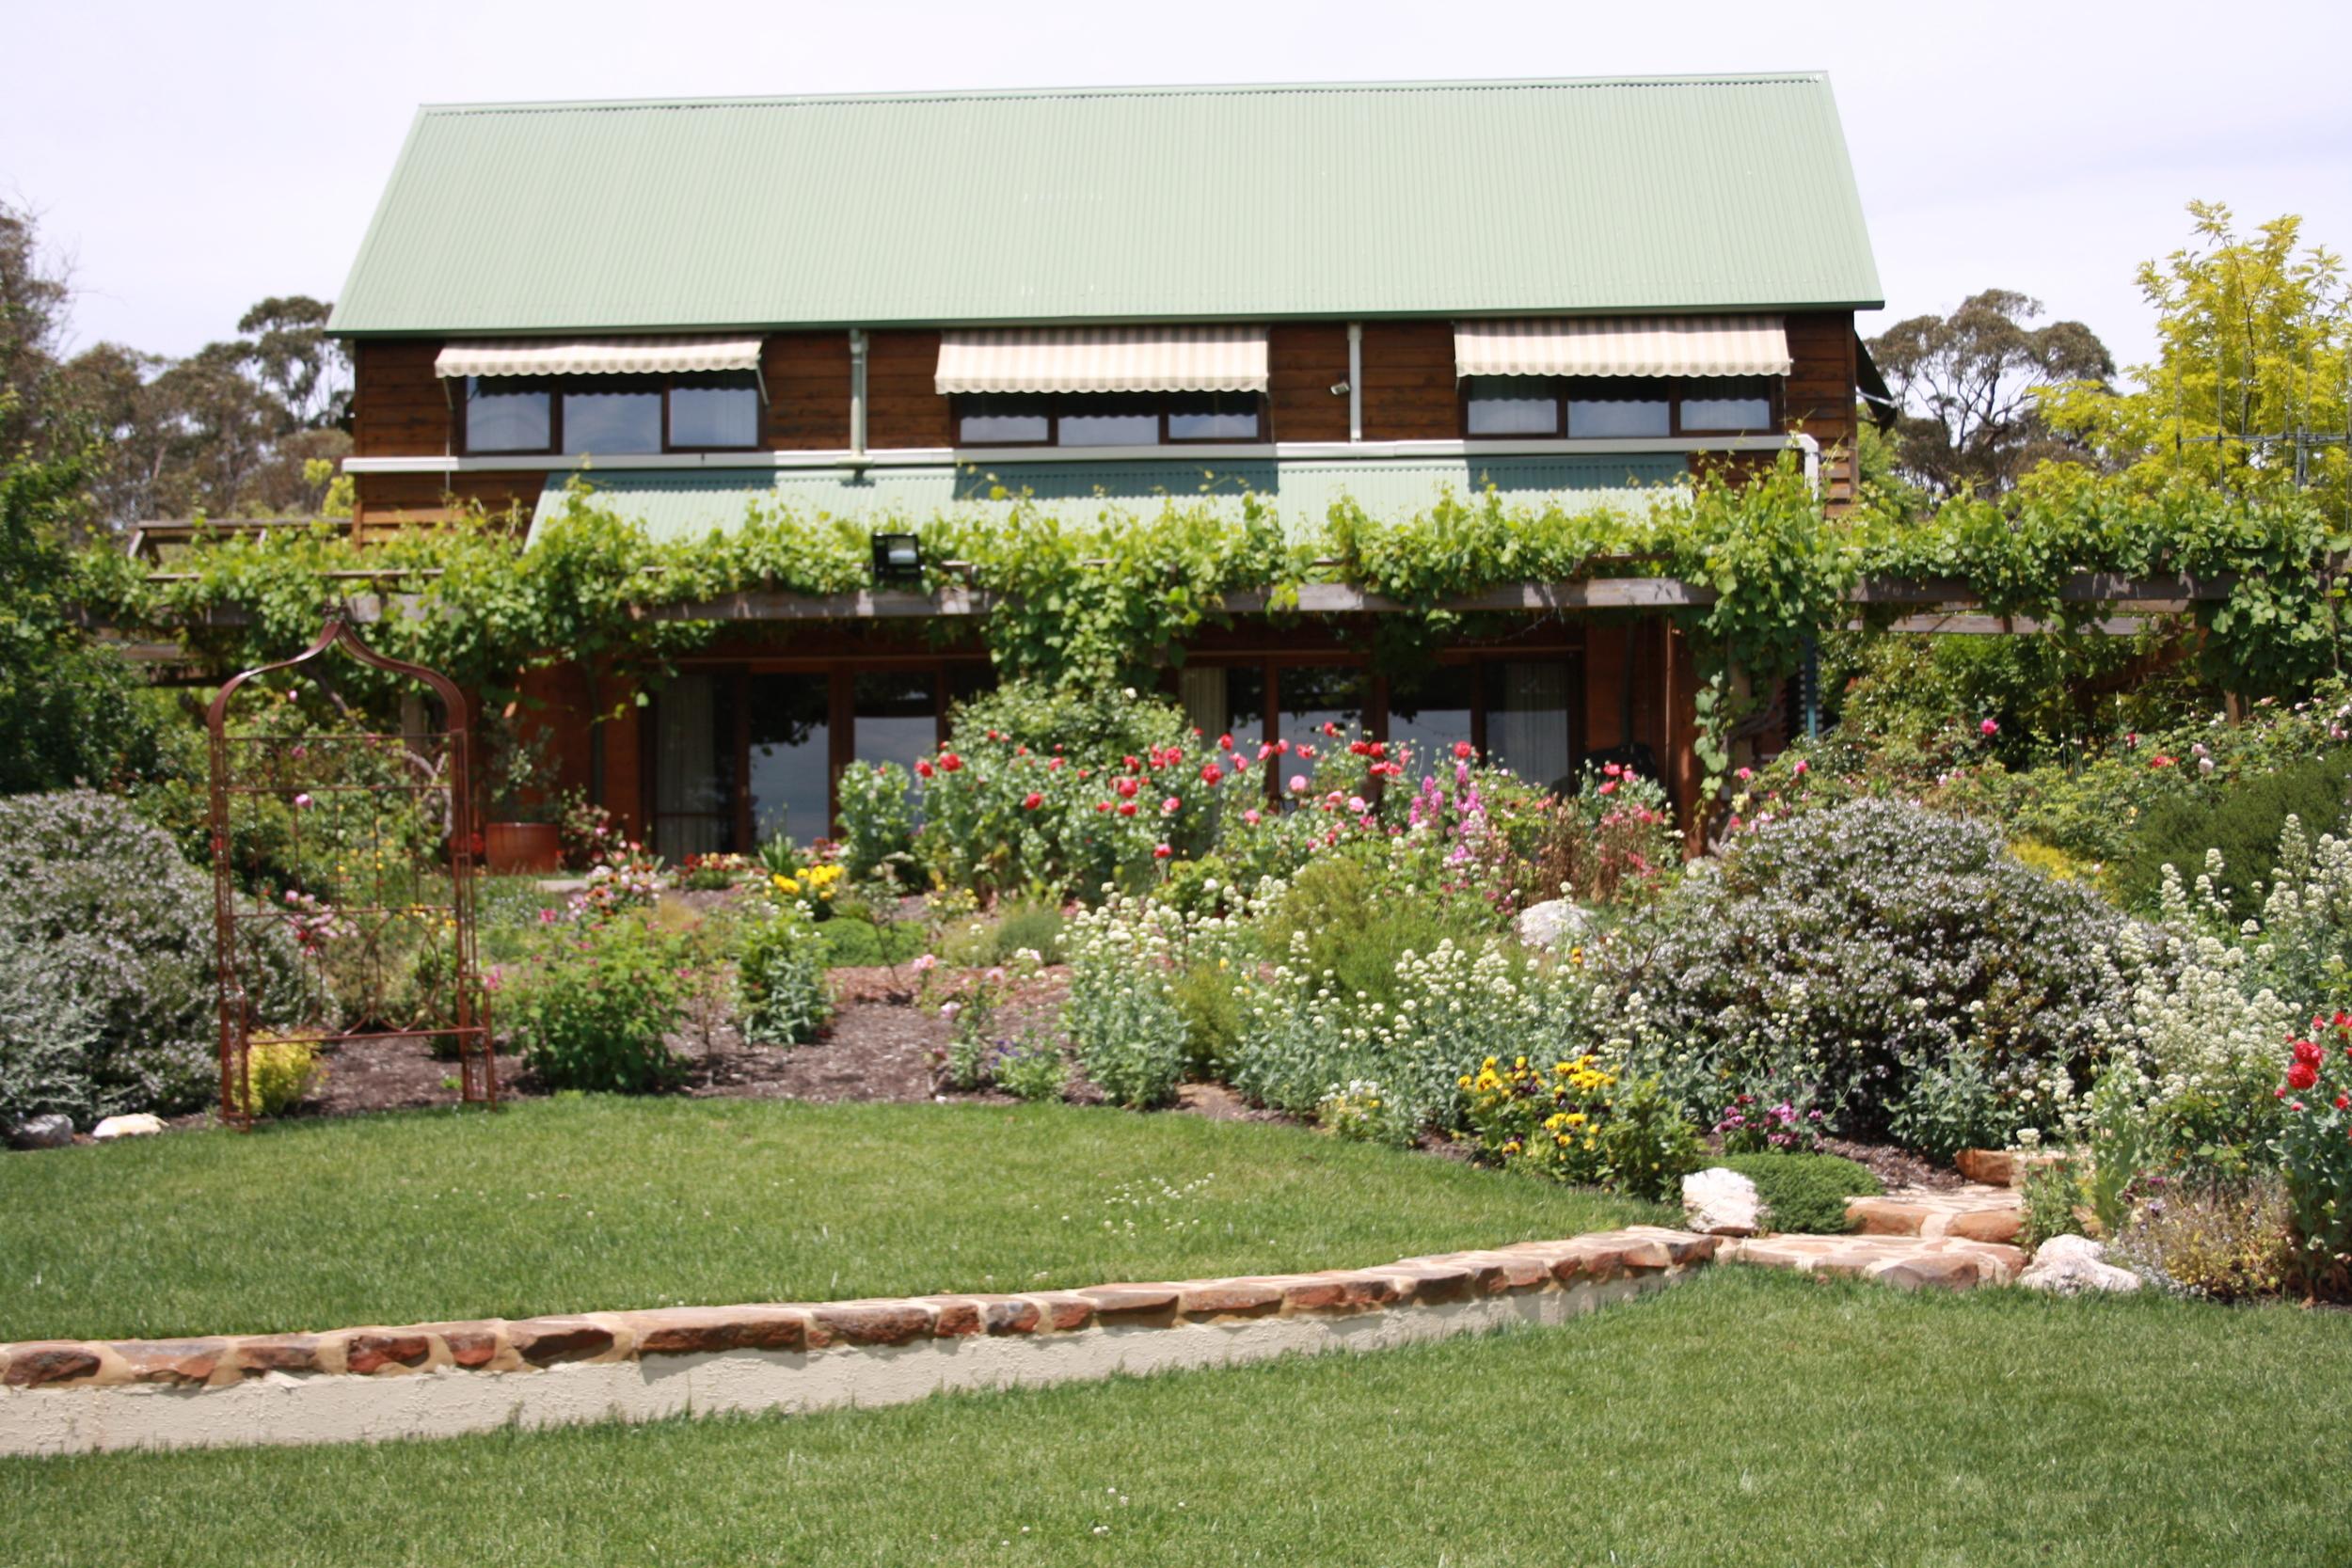 Andrew_Economos_Custom_Builder_Bowral_NSW_Australia_Earth_Home_8.JPG